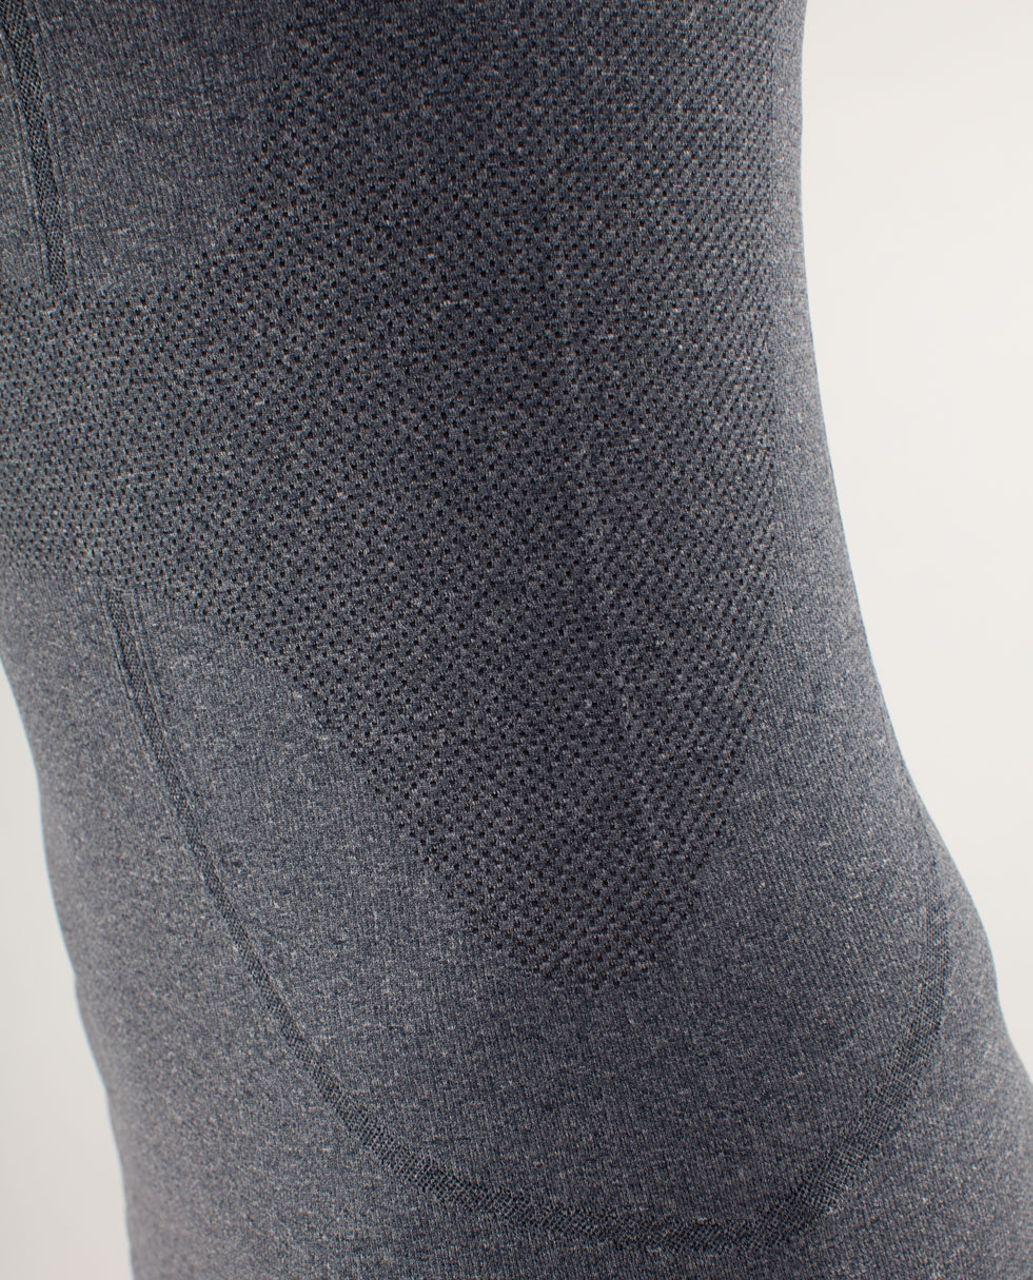 Lululemon Run:  Swiftly Tech Short Sleeve - Inkwell / Black